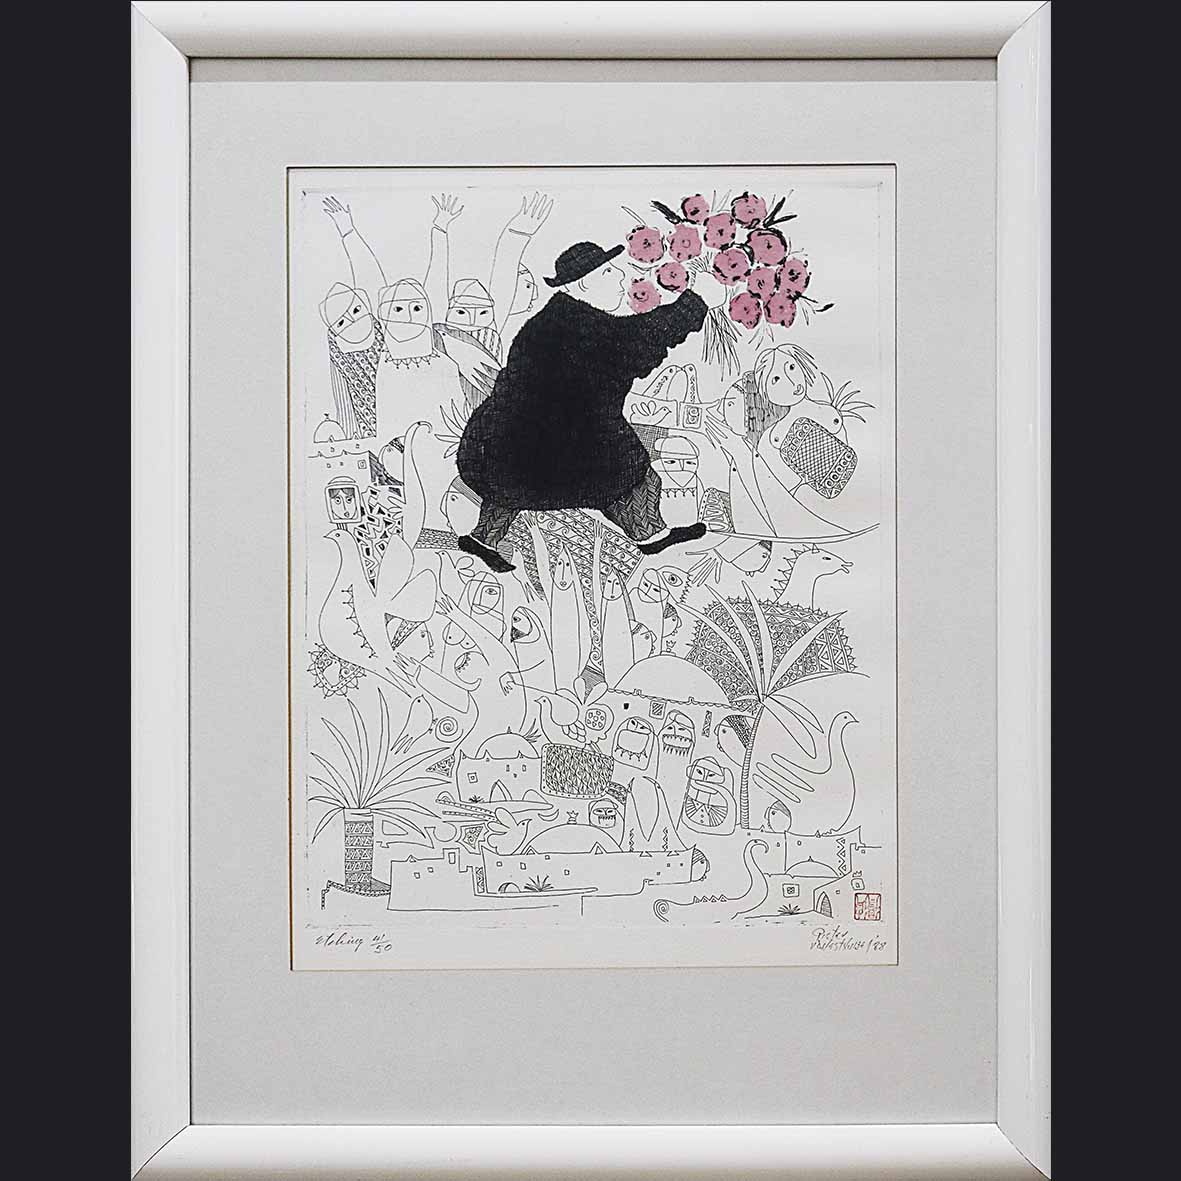 pieter van der Westhuizen, SA(1920-2010), untitled, signed 1988, etching 41 of 50. 40x50 cm